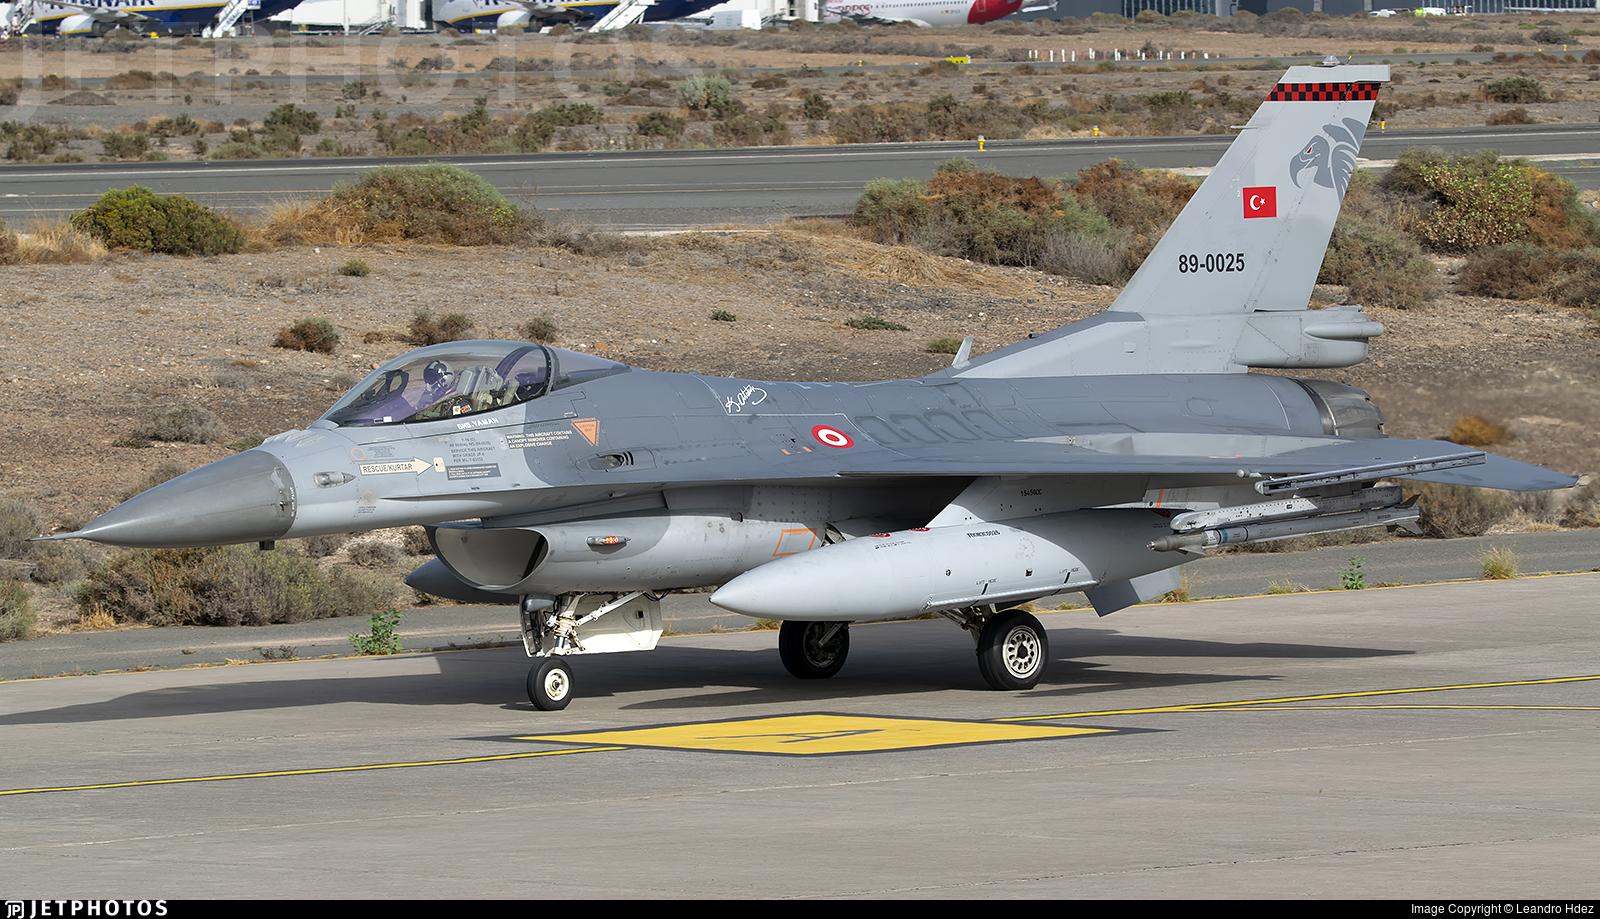 89-0025 - General Dynamics F-16C Fighting Falcon - Turkey - Air Force